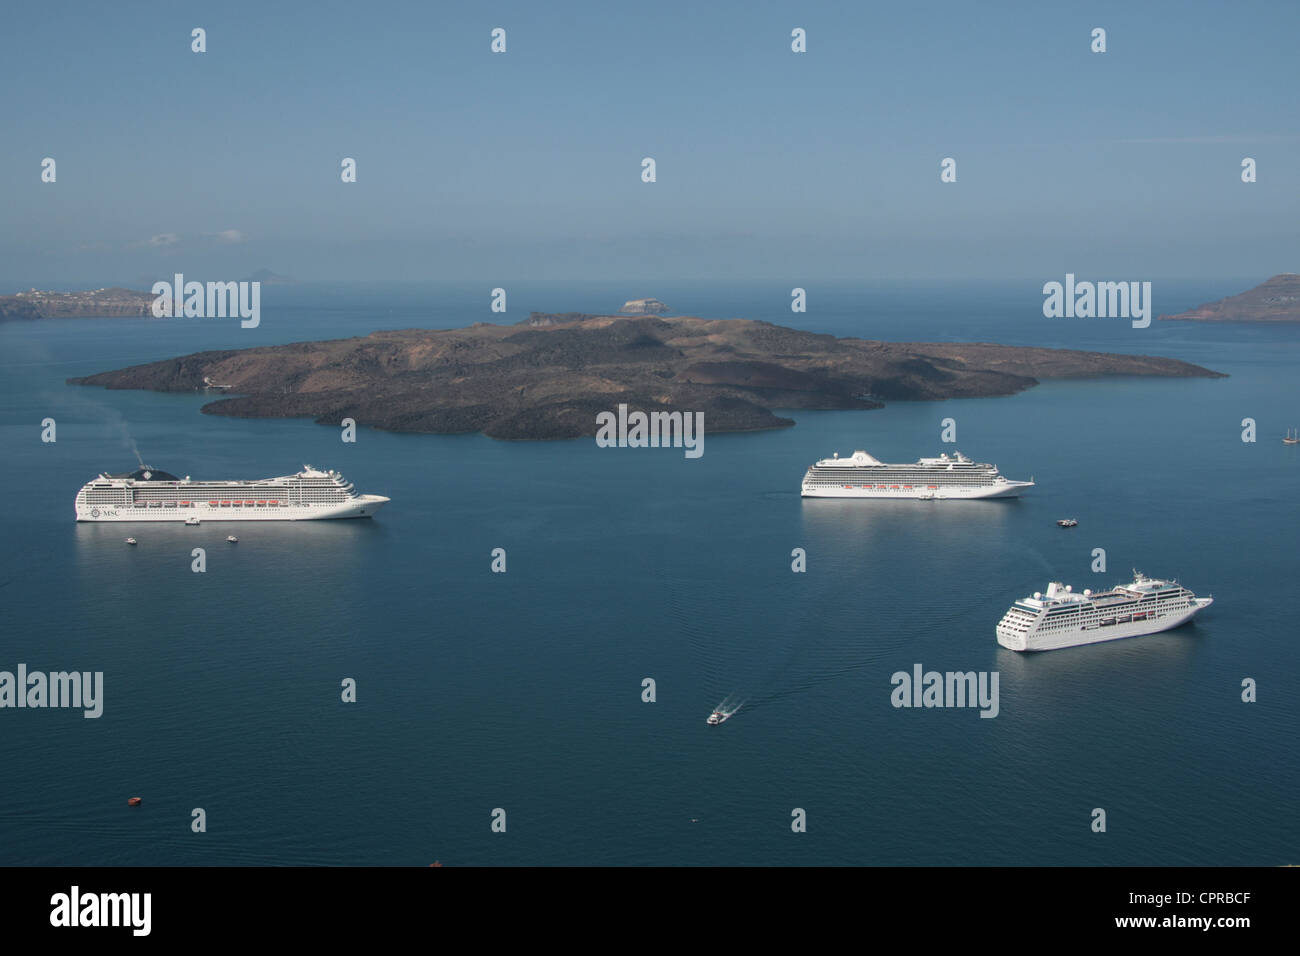 Cruise ships anchored in the caldera at Santorini, Greece - Stock Image